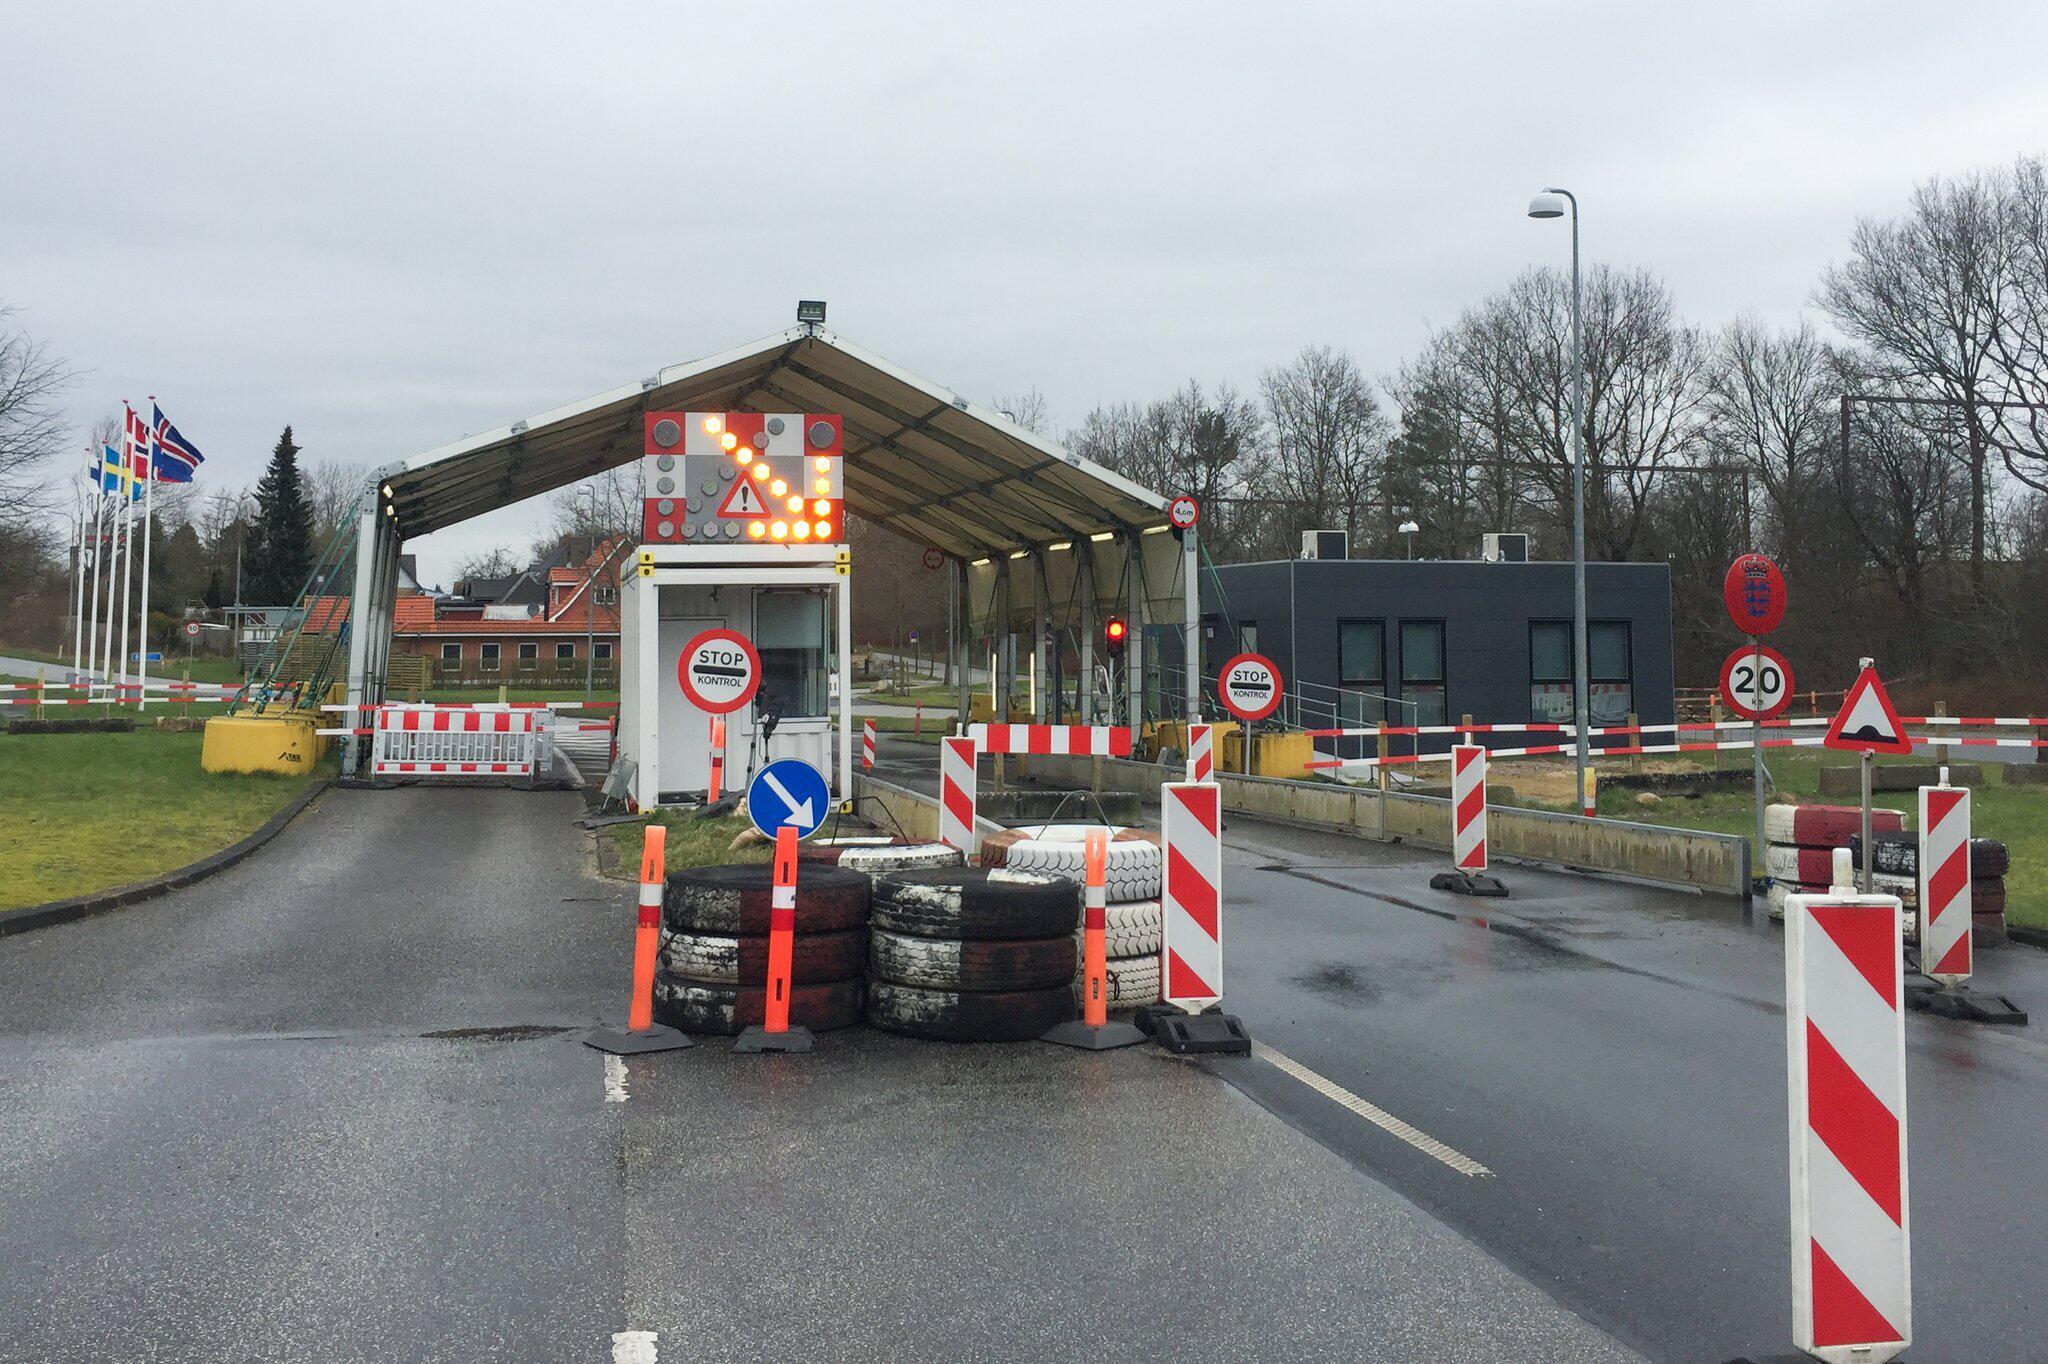 Bild zu Coronavirus - Dänemark hat Grenze geschlossen